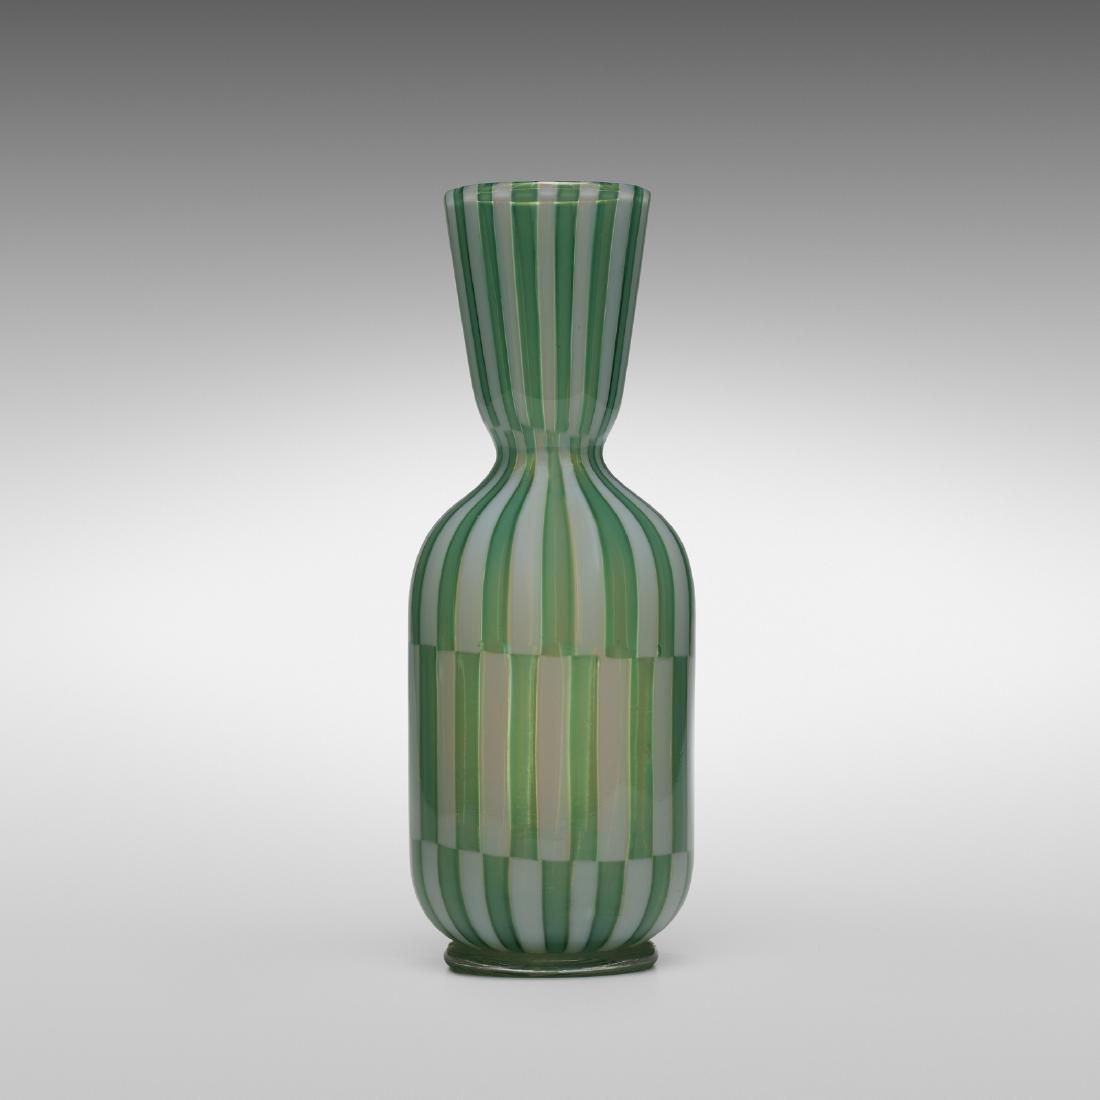 Ercole Barovier, Bicolori vase